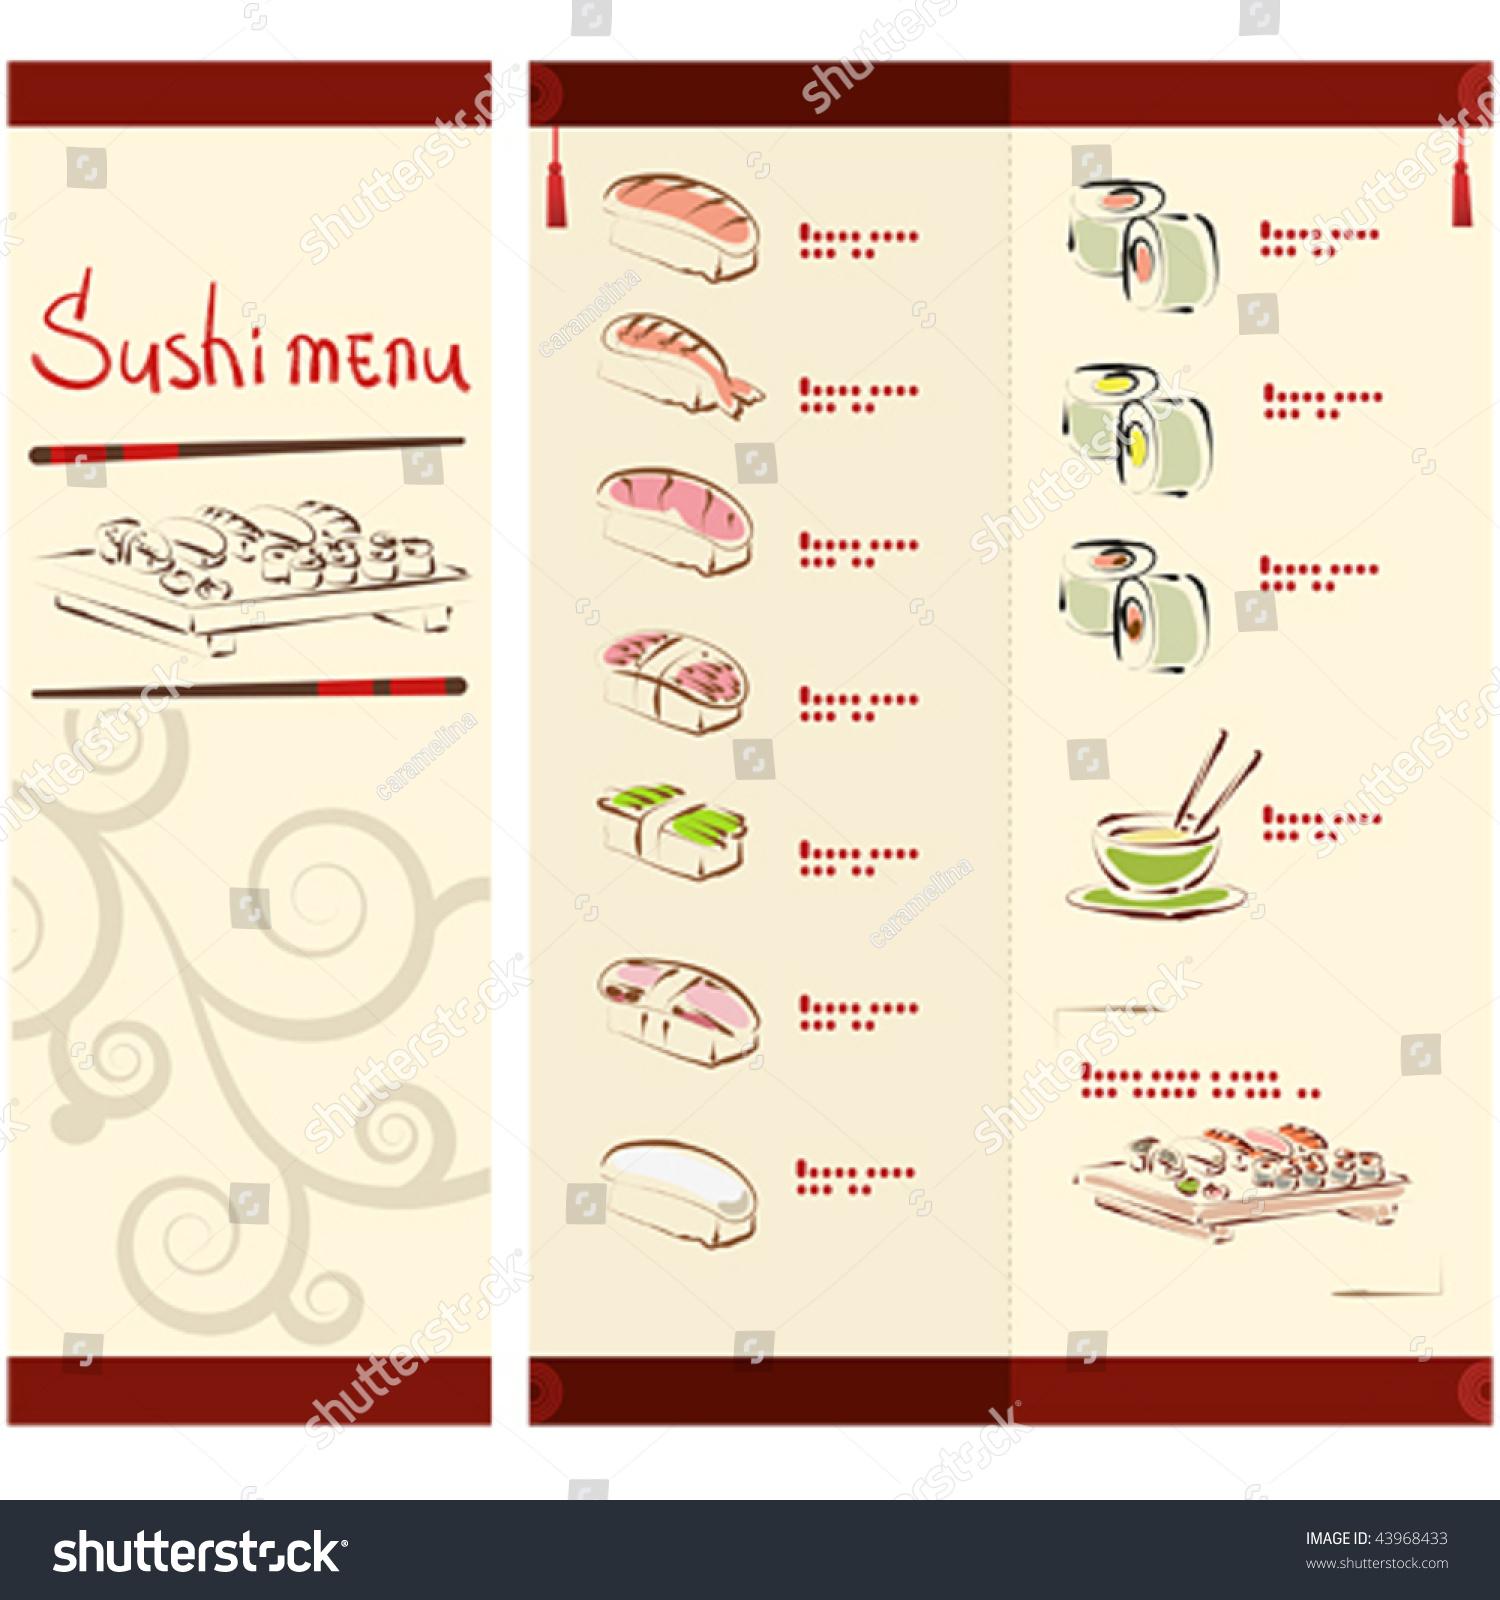 Sushi menu template stock vector 43968433 shutterstock sushi menu template pronofoot35fo Gallery